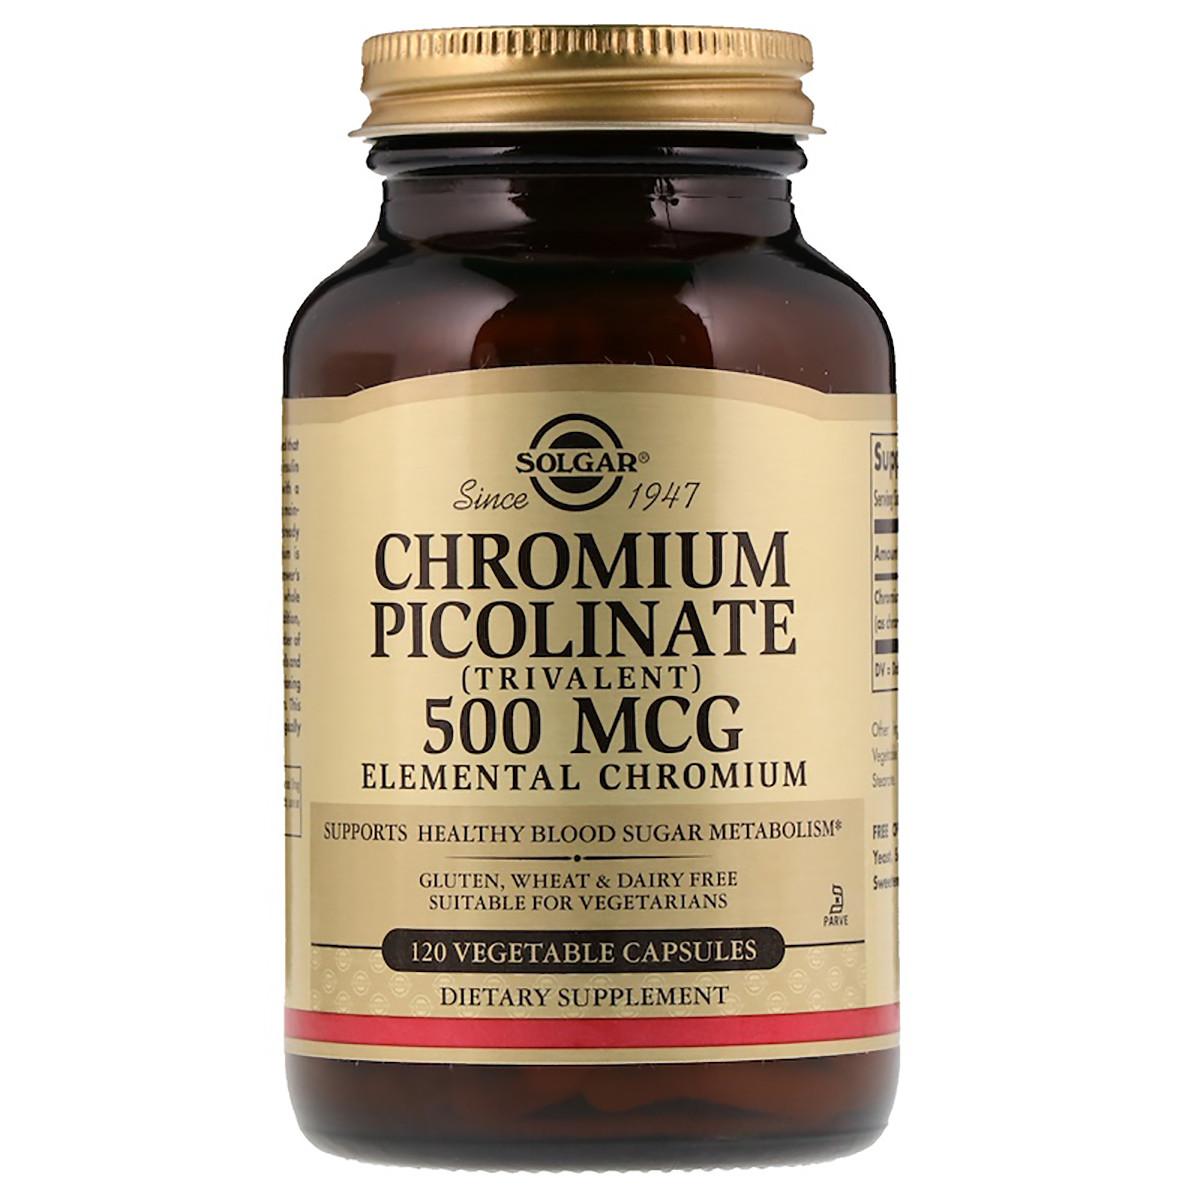 Хром Пиколинат, Chromium Picolinate, Solgar, 500 мкг, 120 капсул